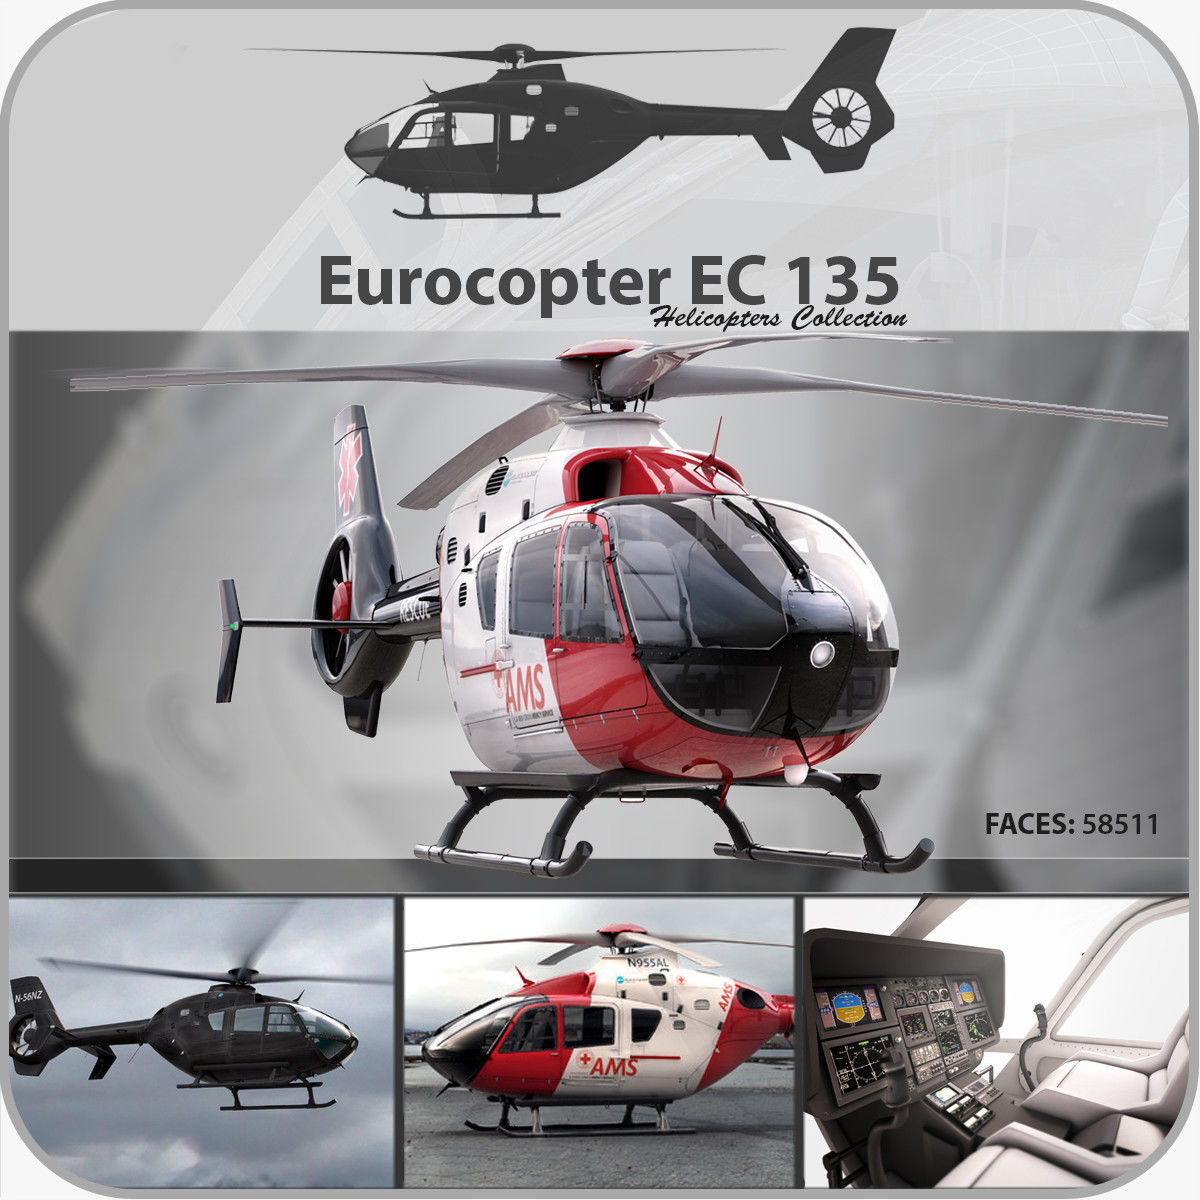 Eurocopter EC 135 Pack